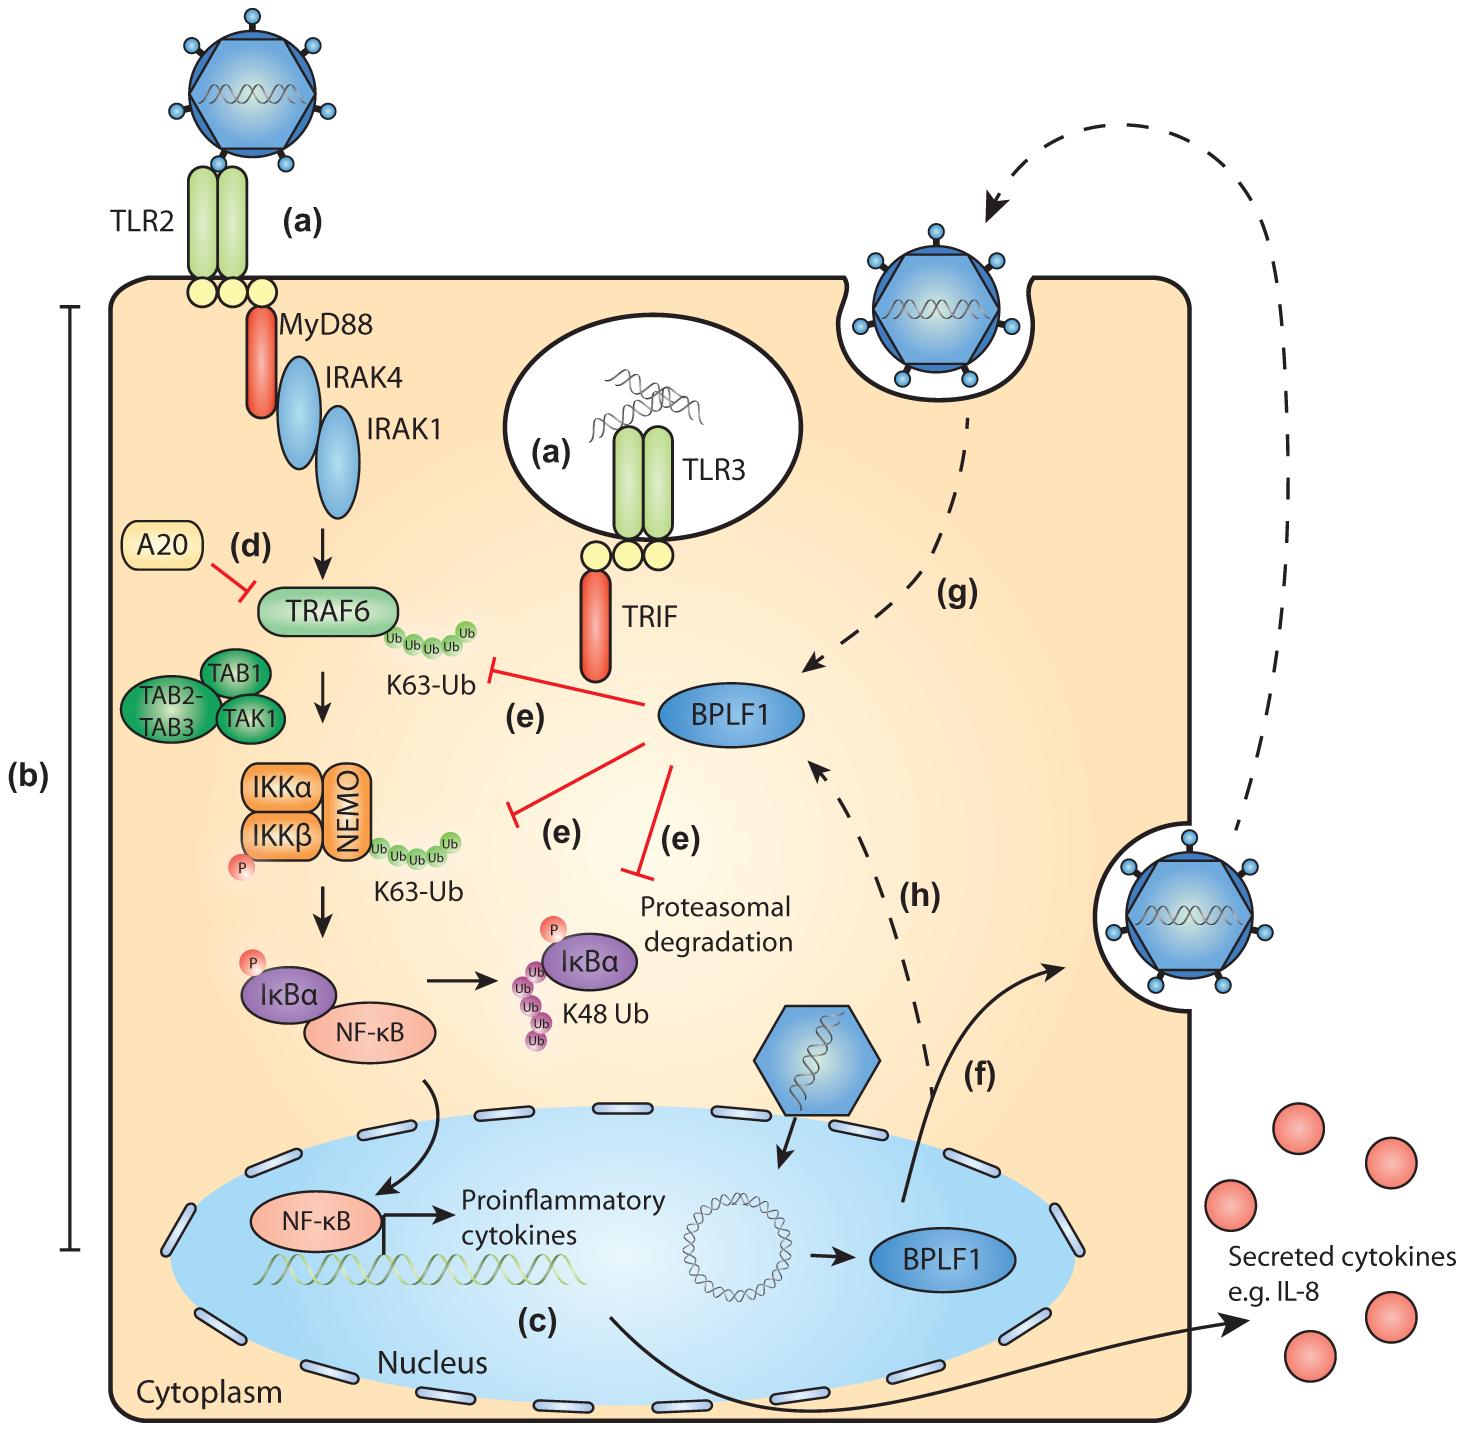 Schematic model of BPLF1-mediated TLR evasion during EBV infection.